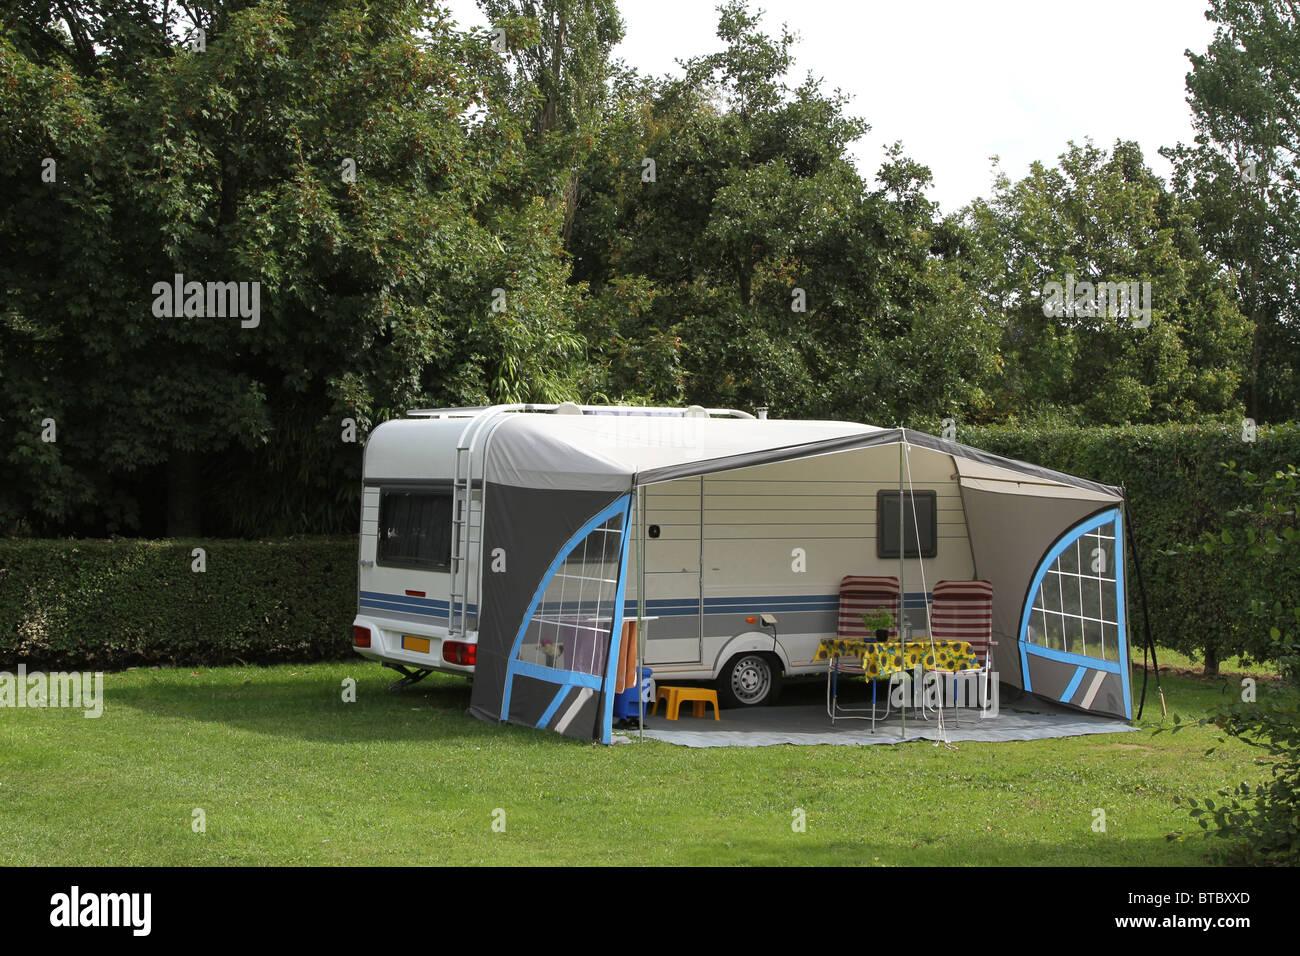 Touring caravan and awning on a pleasant woodland caravan park campsite. - Stock Image